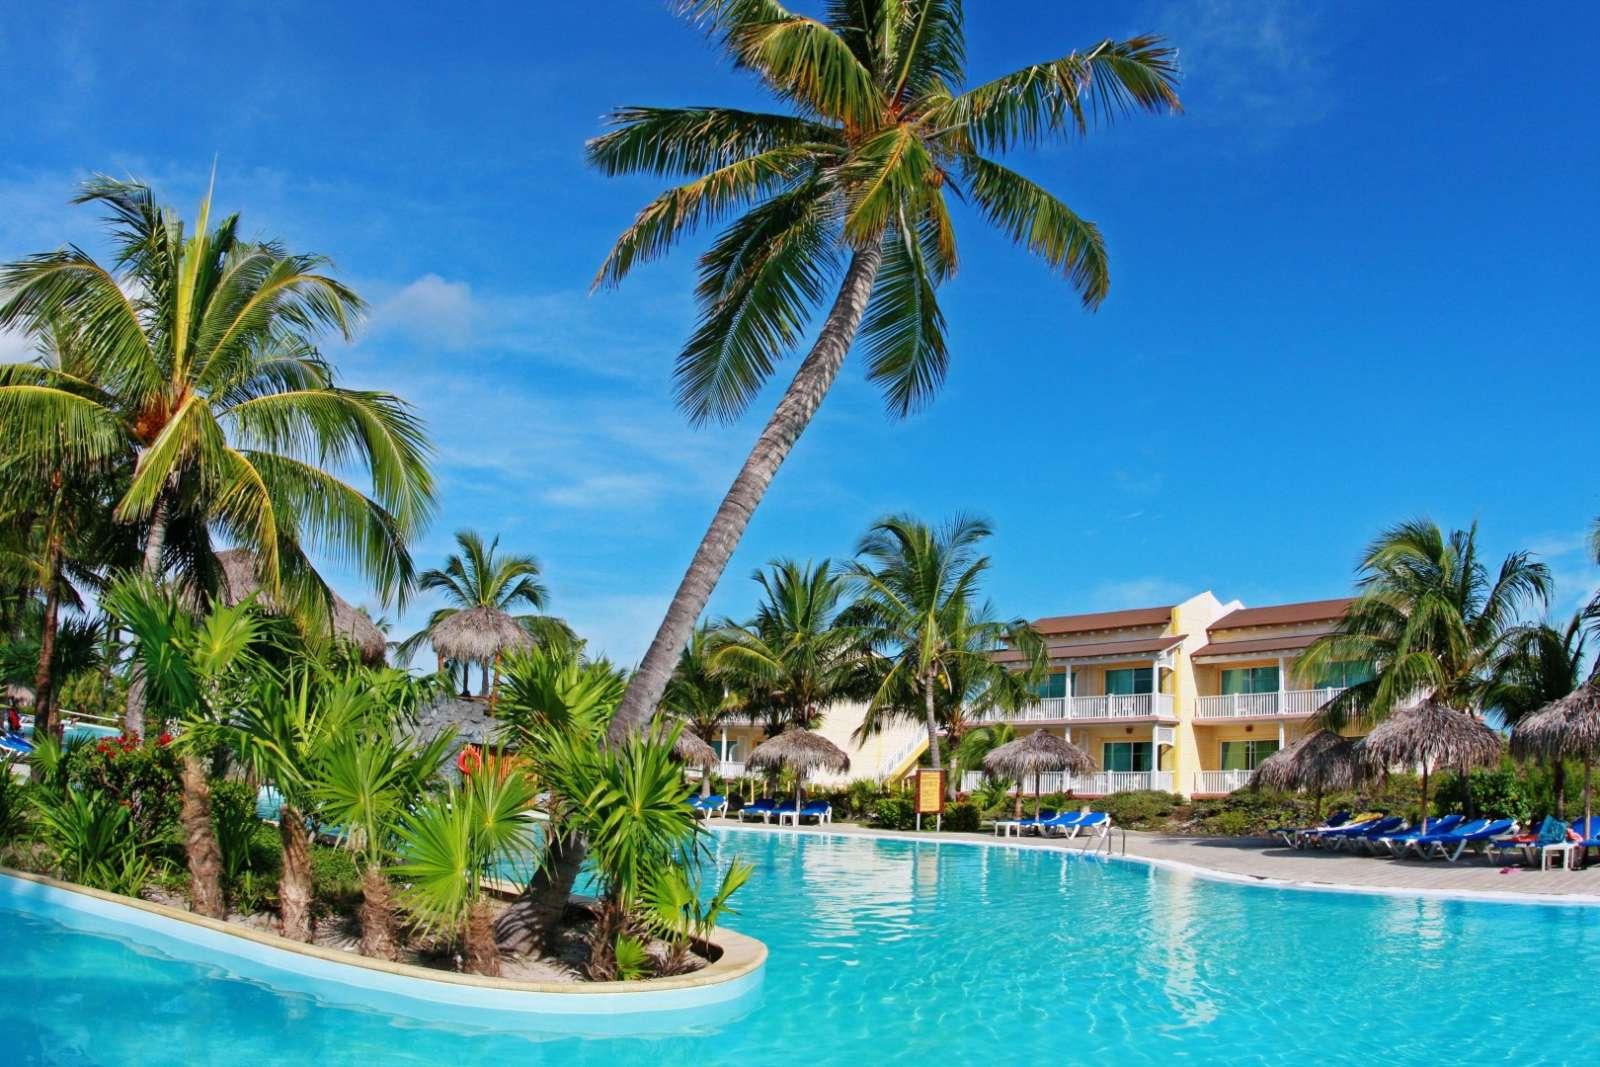 Pool at Sol Cayo Largo